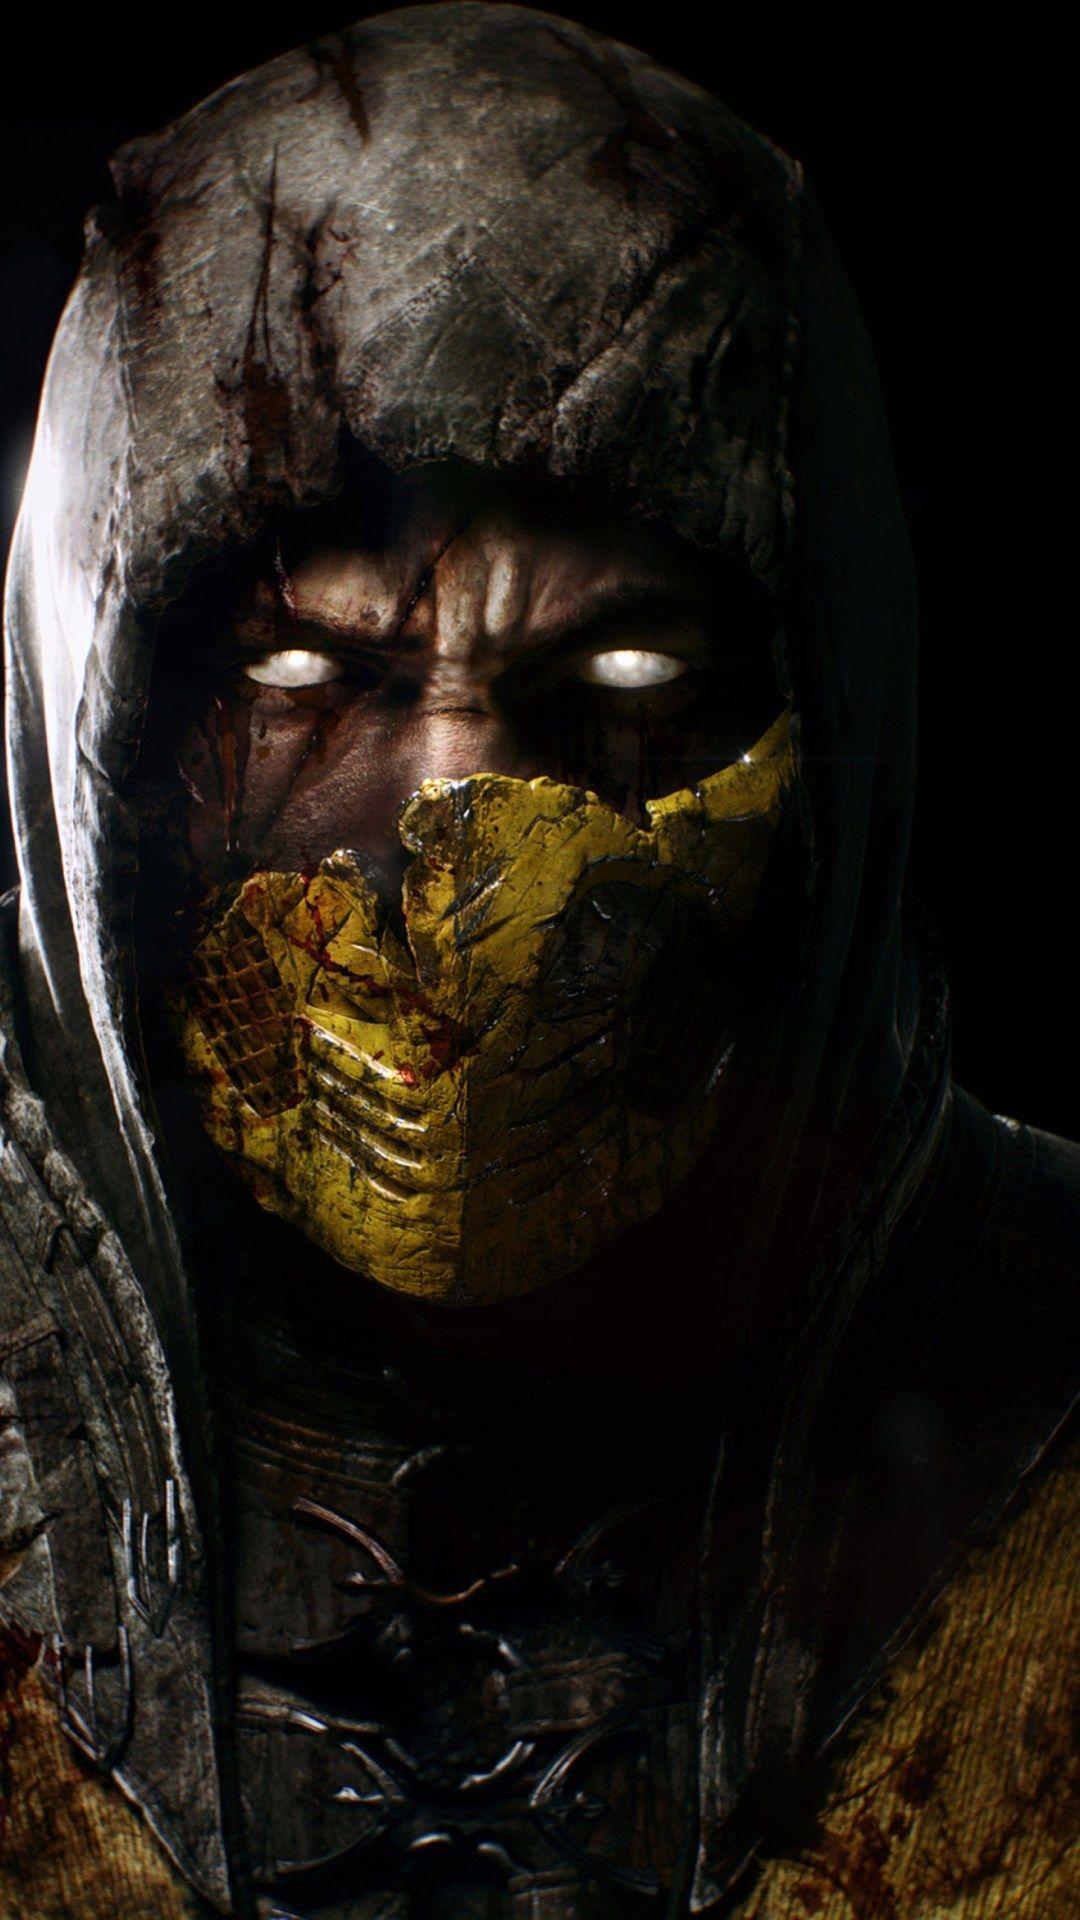 scorpion marvel wallpaper for iphone Mortal kombat x